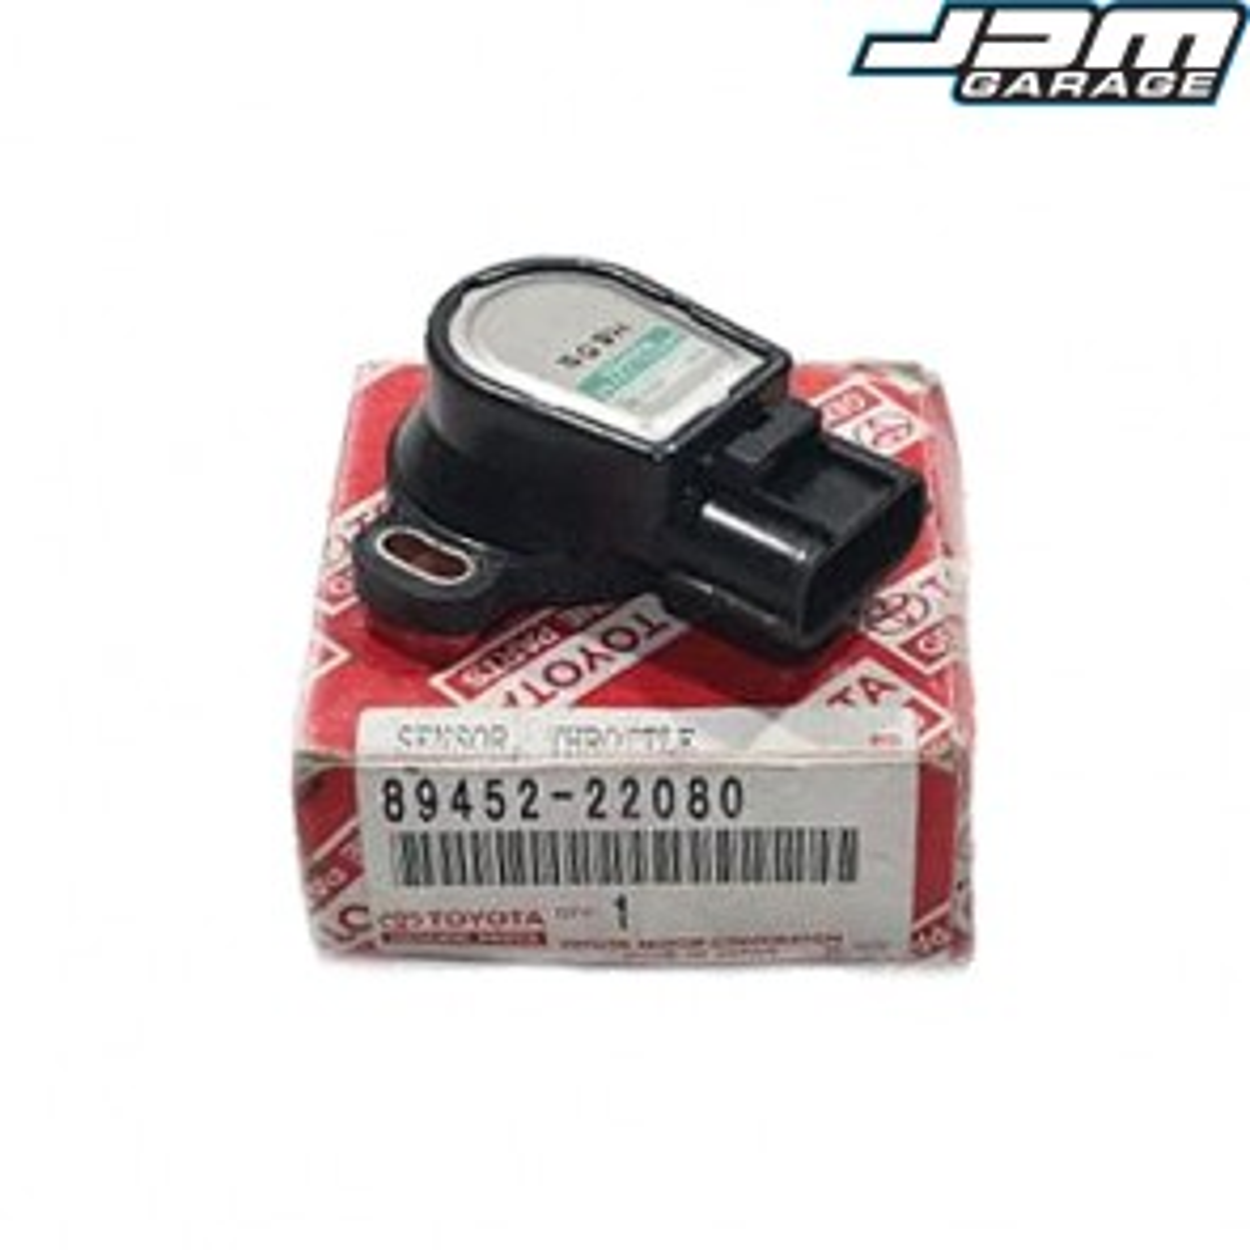 Genuine Toyota Throttle Position Sensor TPS 1JZ-GTE 2JZ-GTE For Toyota Supra Aristo Chaser Cresta Soarer Corolla  89452-22080